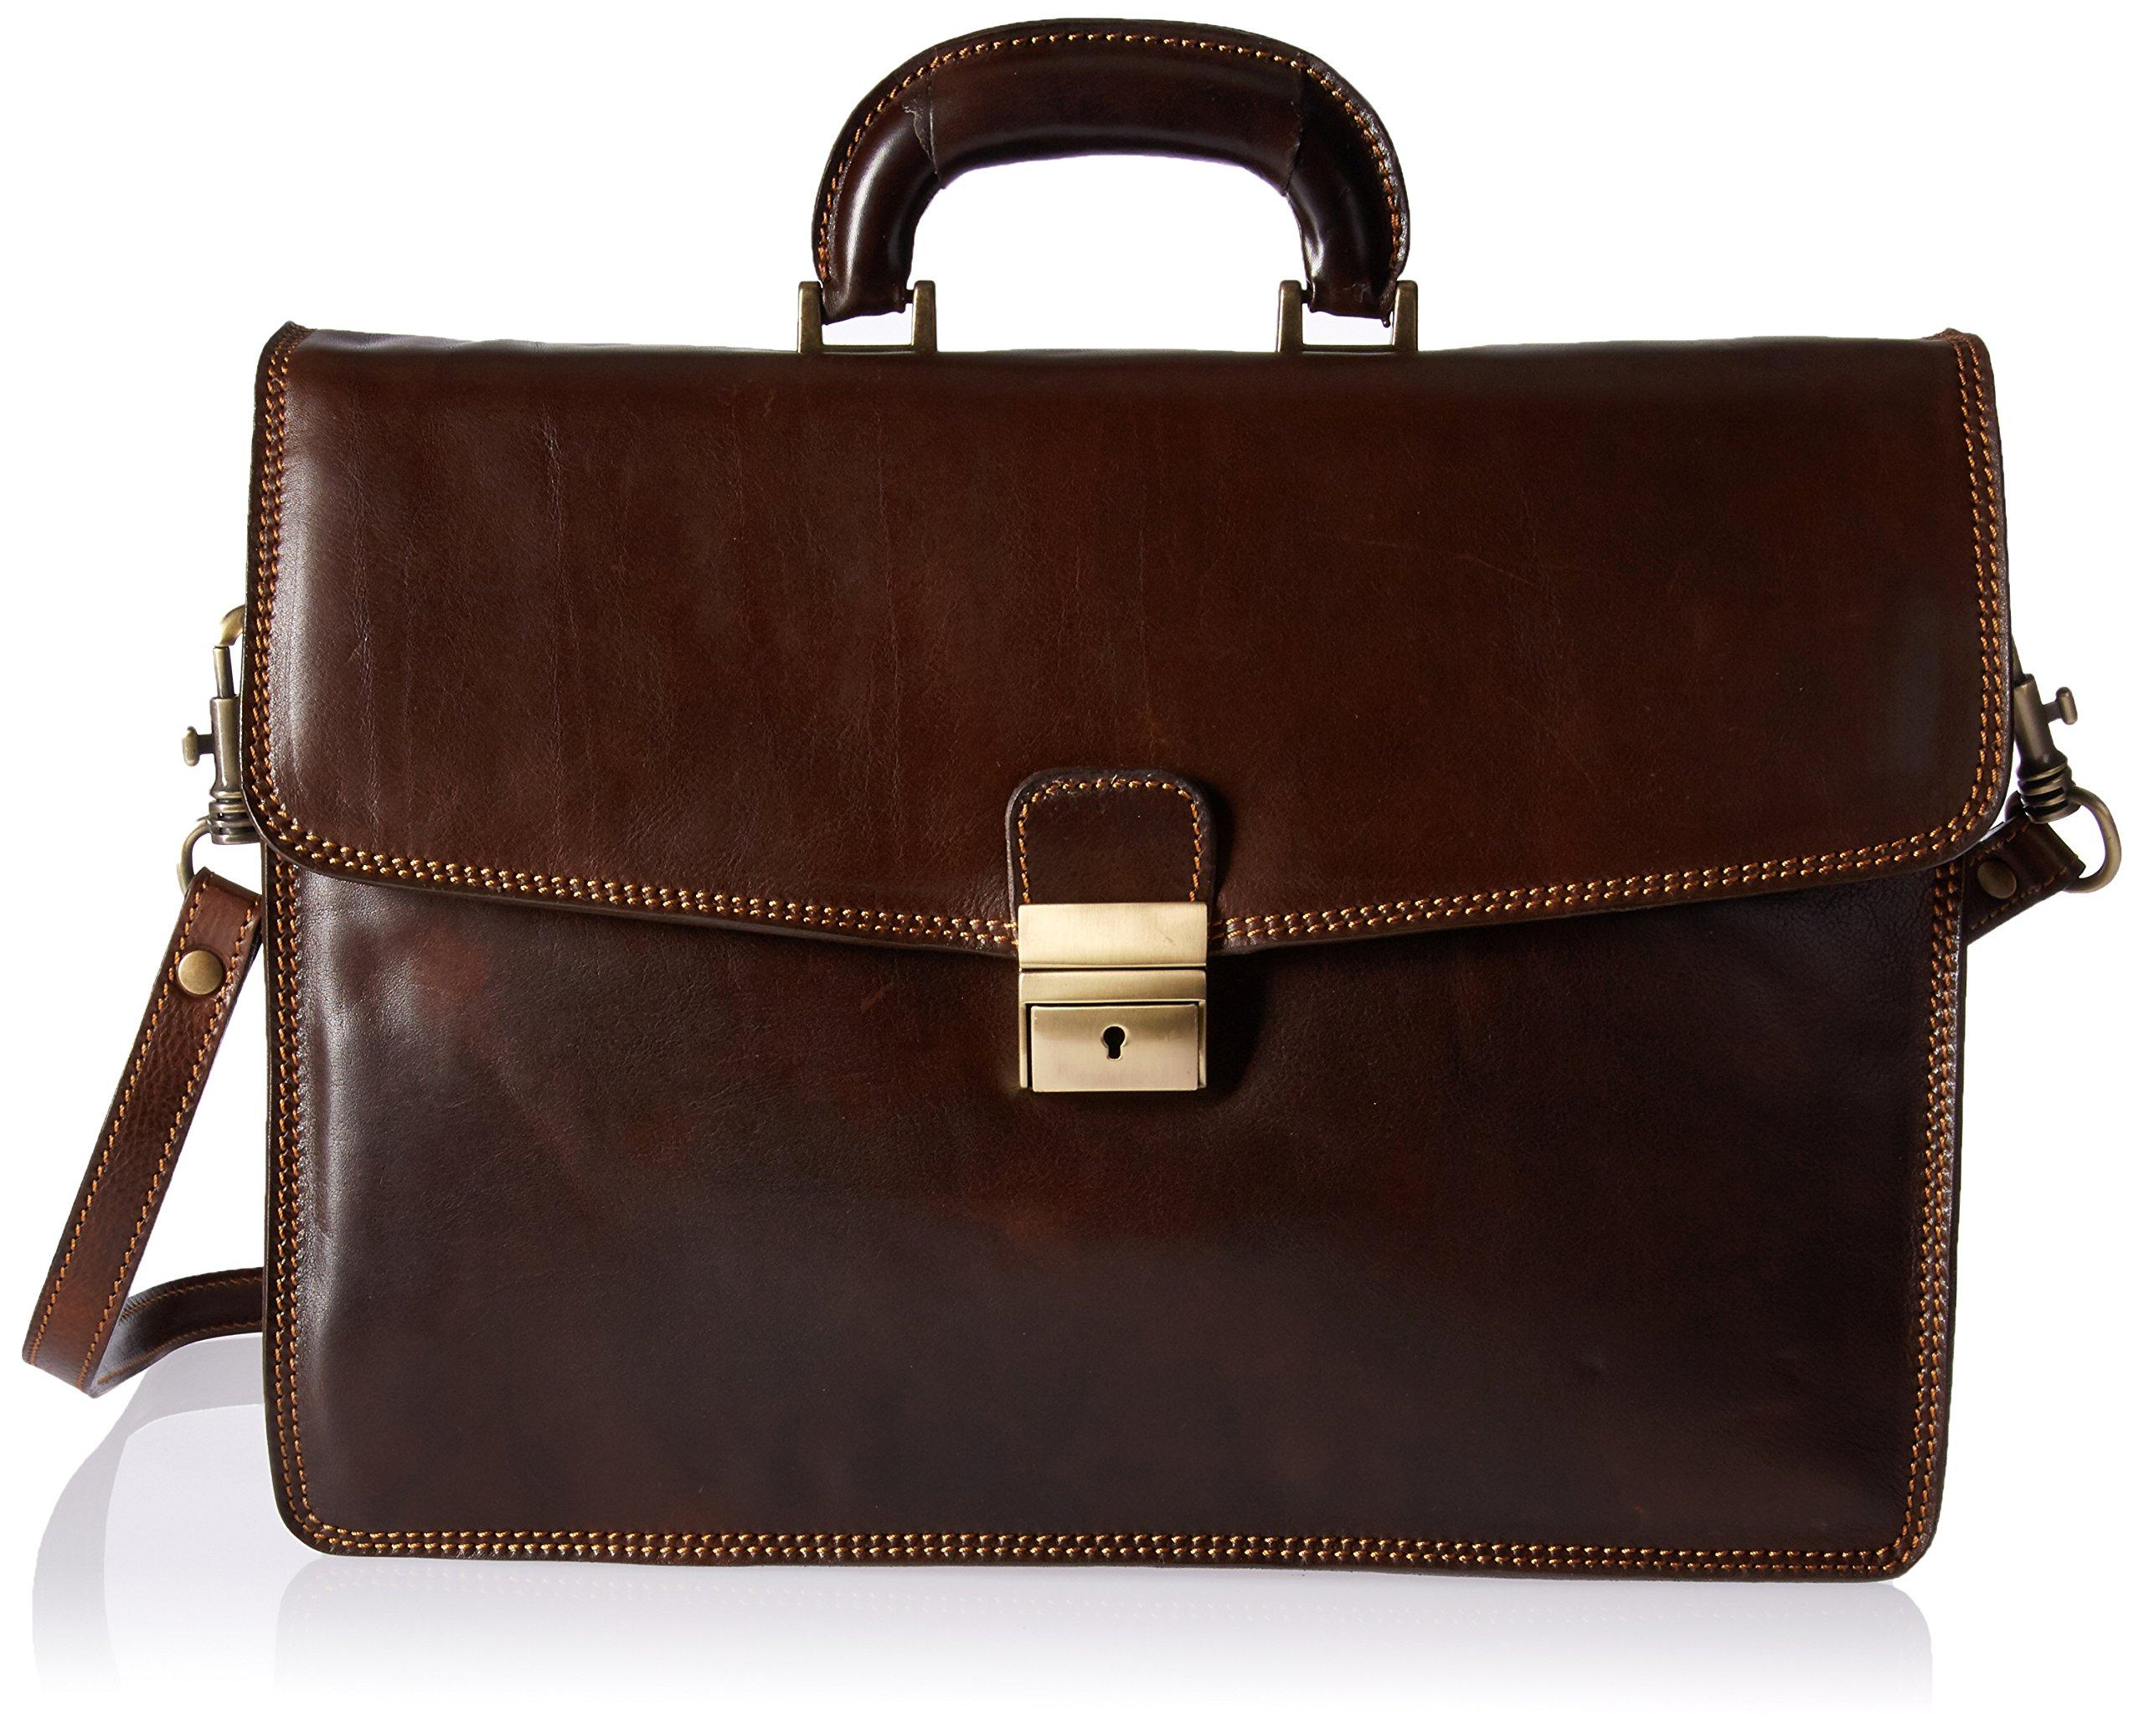 Luggage Depot USA, LLC Men's Alberto Bellucci Italian Leather Single Compartment Slim D. Brn Briefcase, Dark Brown, One Size